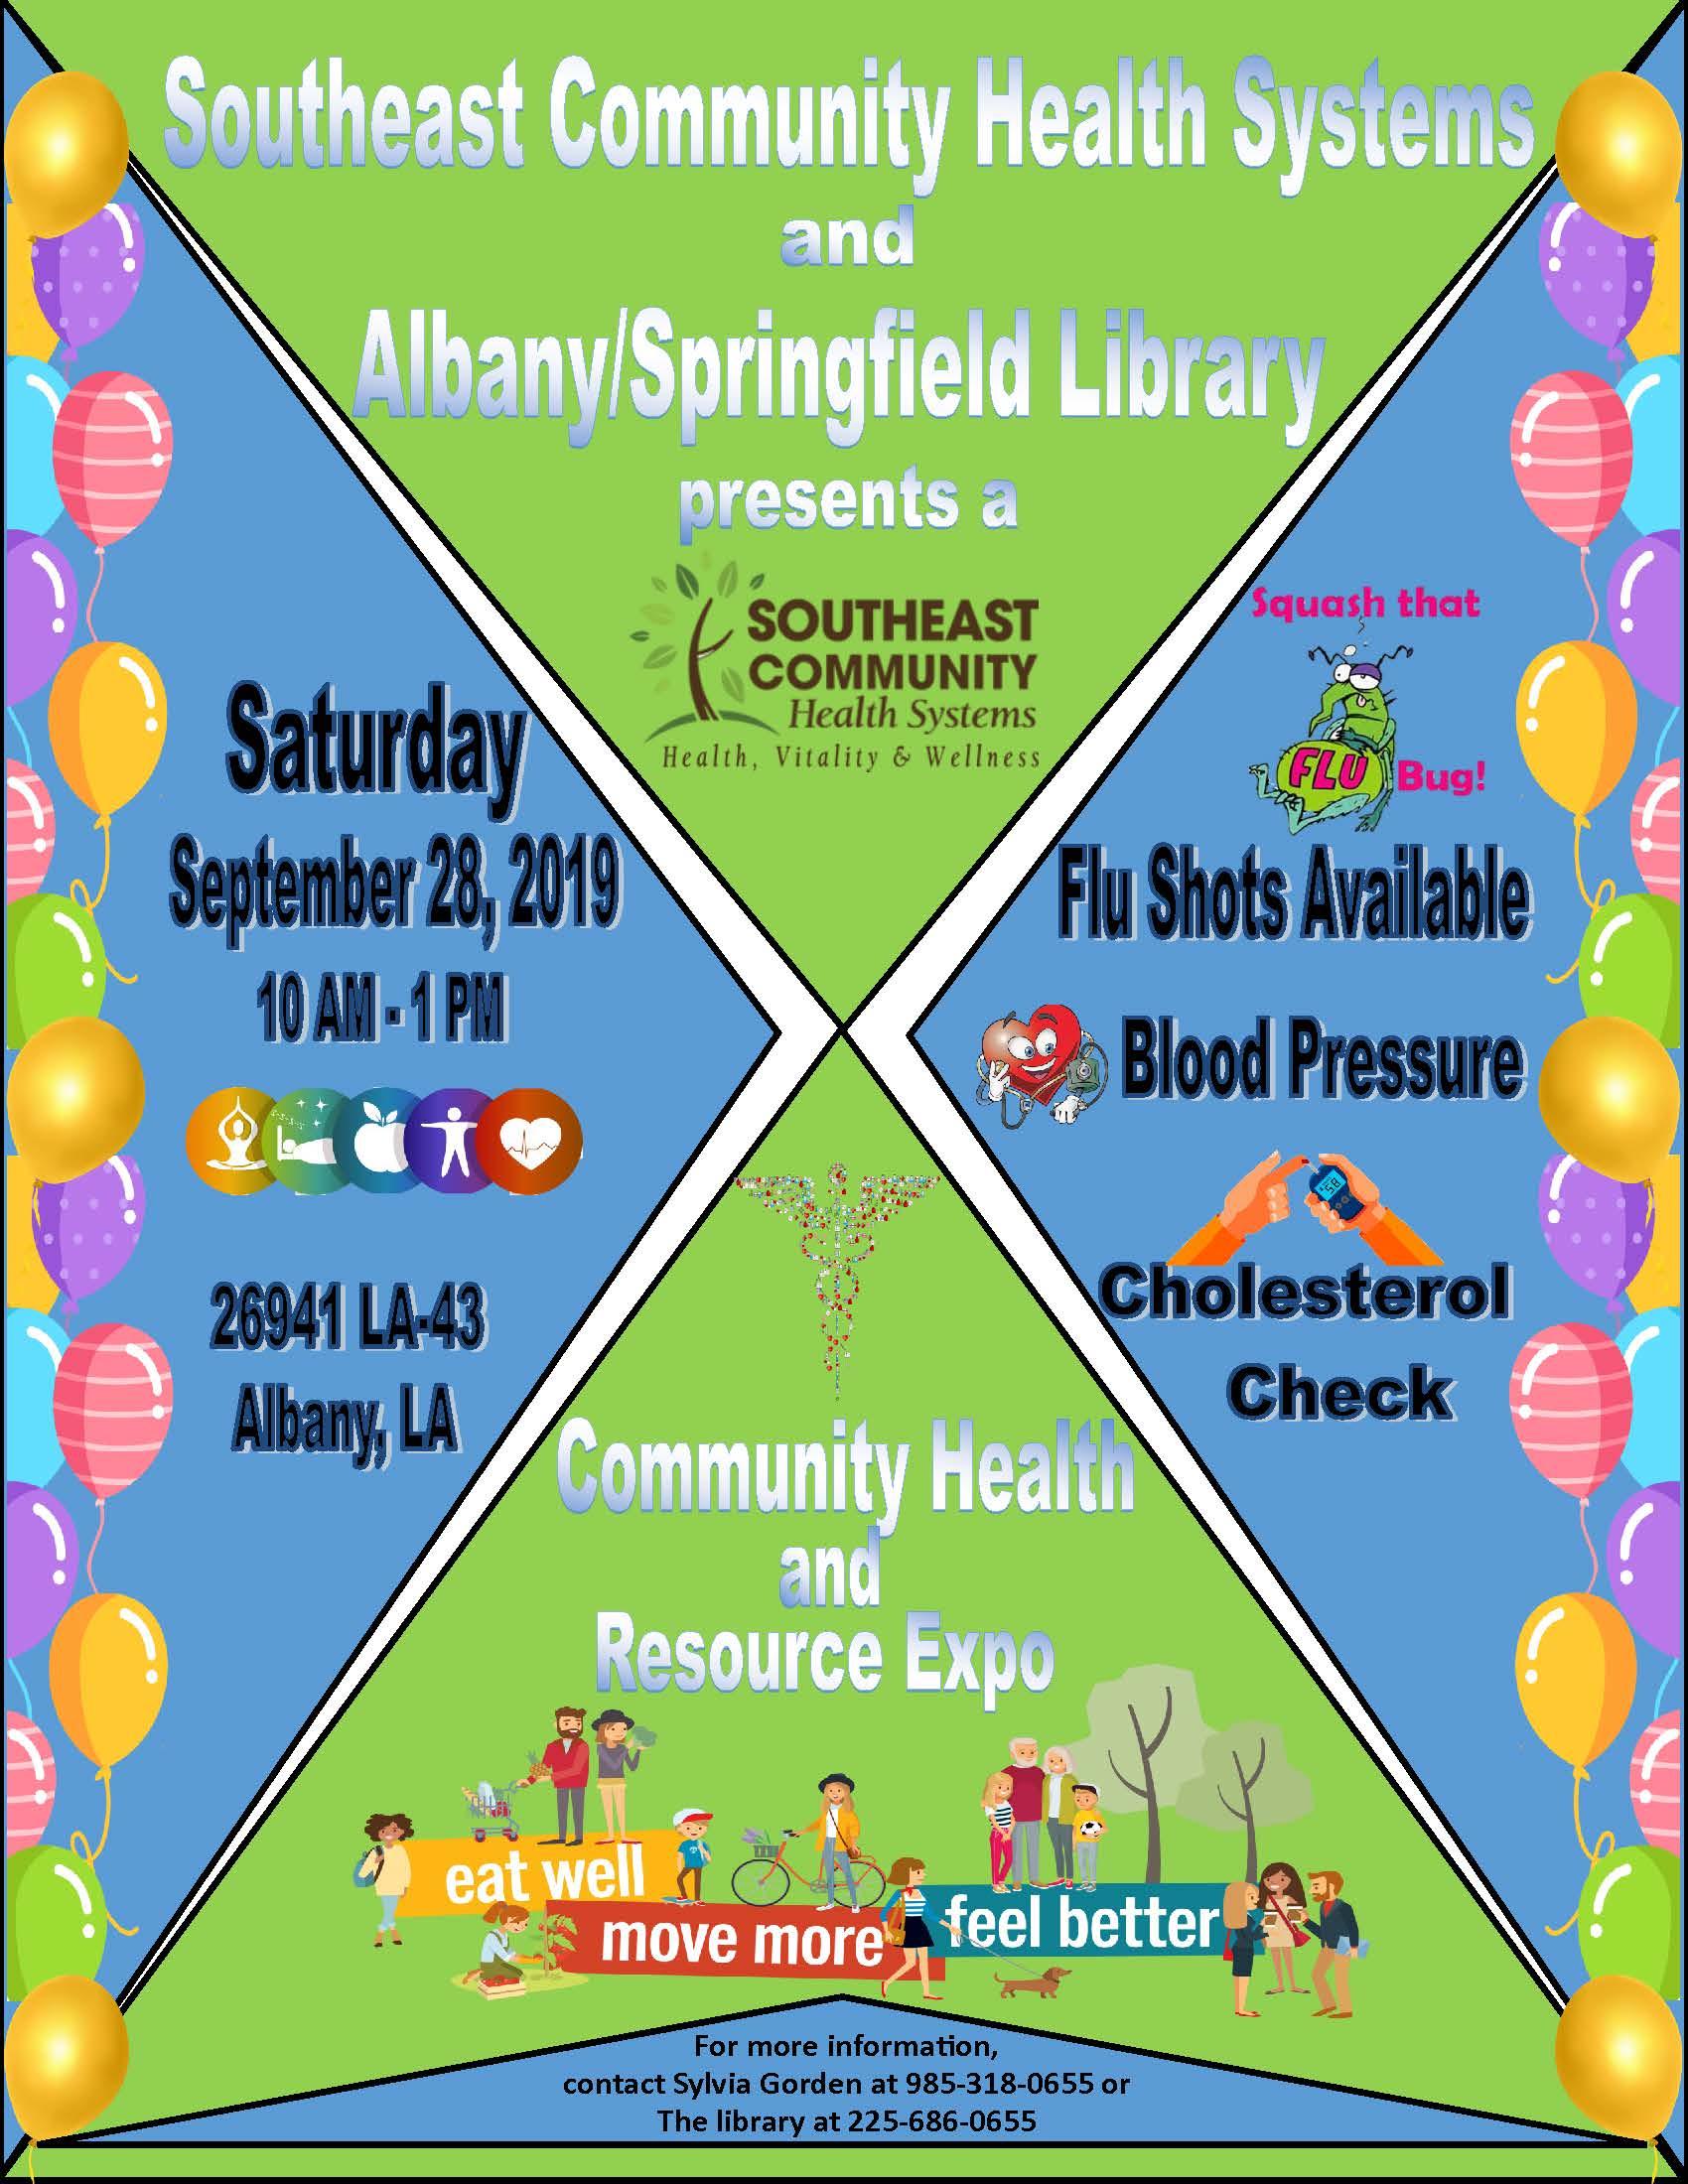 SCHS-Albany Springfield Library Health Expo.